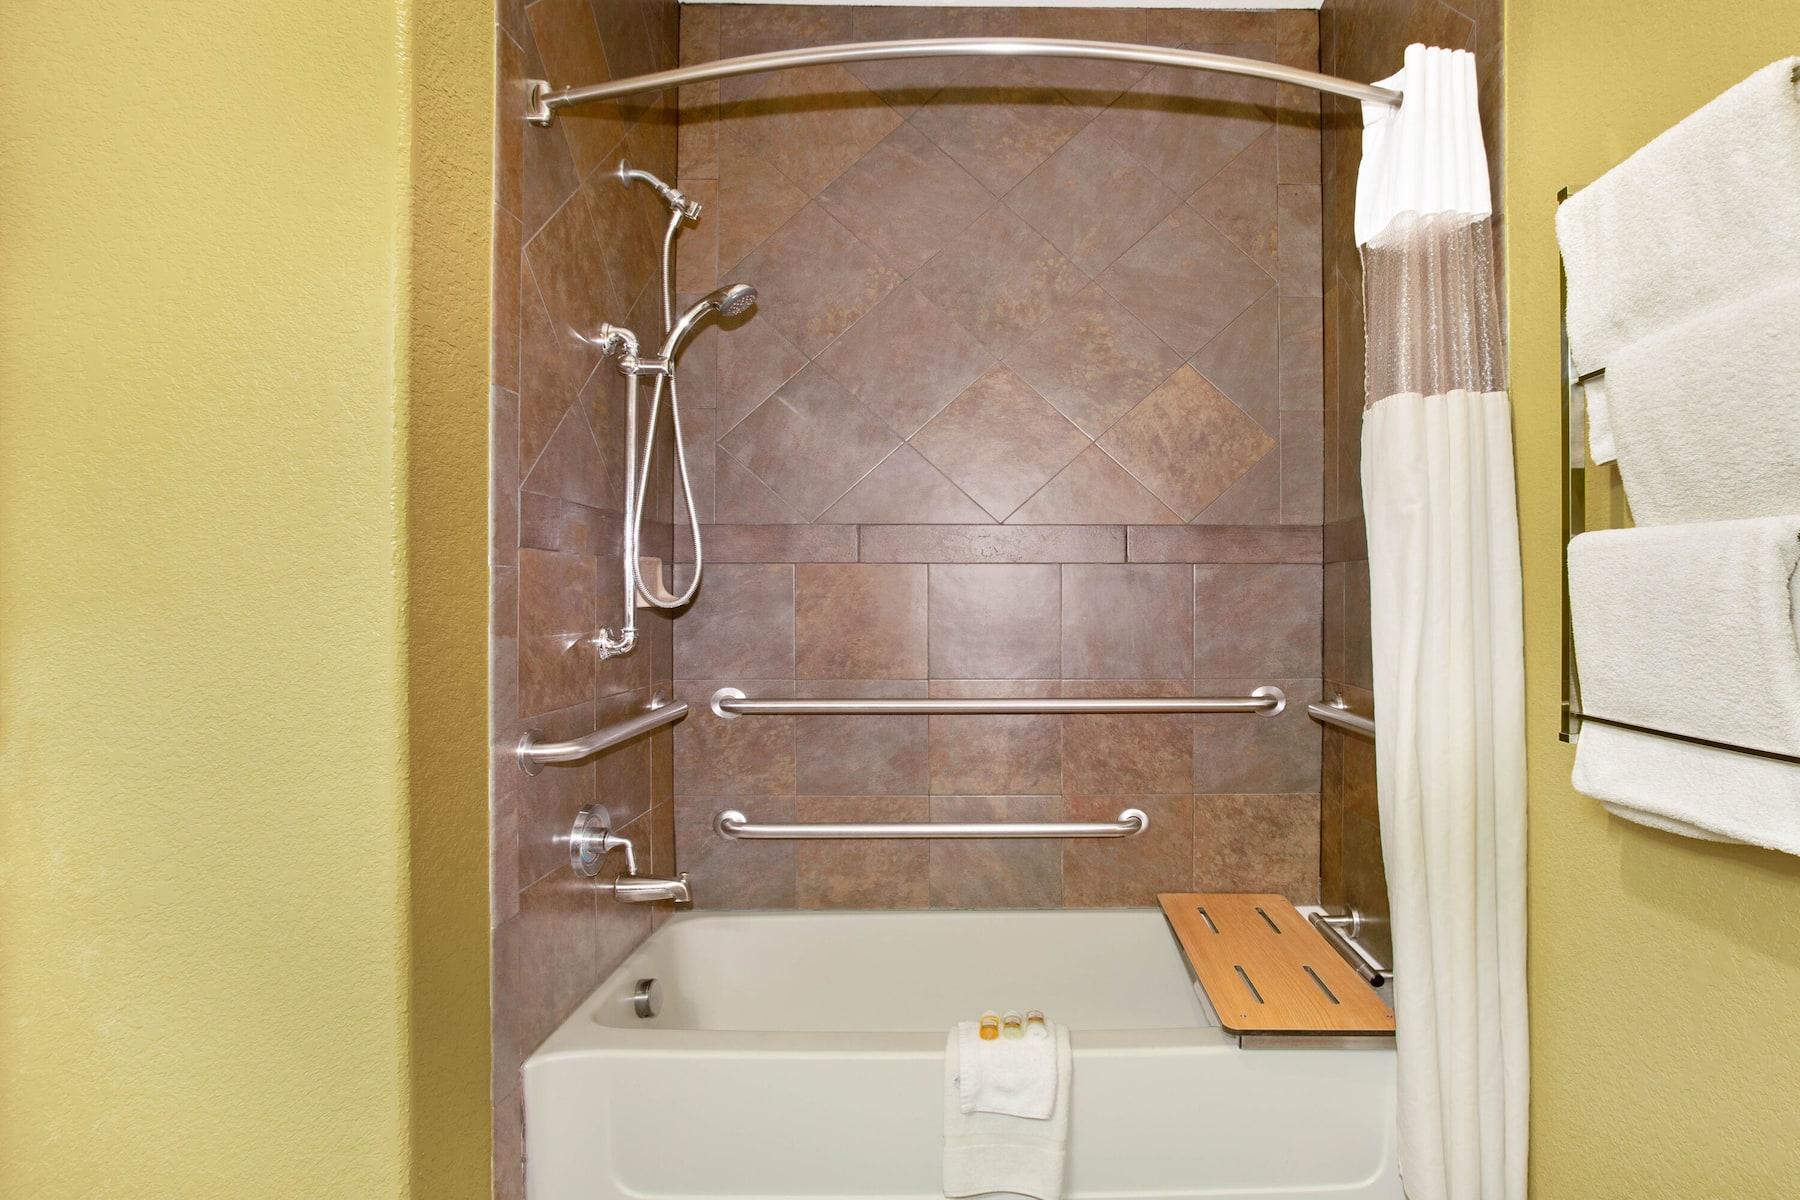 La Quinta Inn Amp Suites By Wyndham Marble Falls Marble